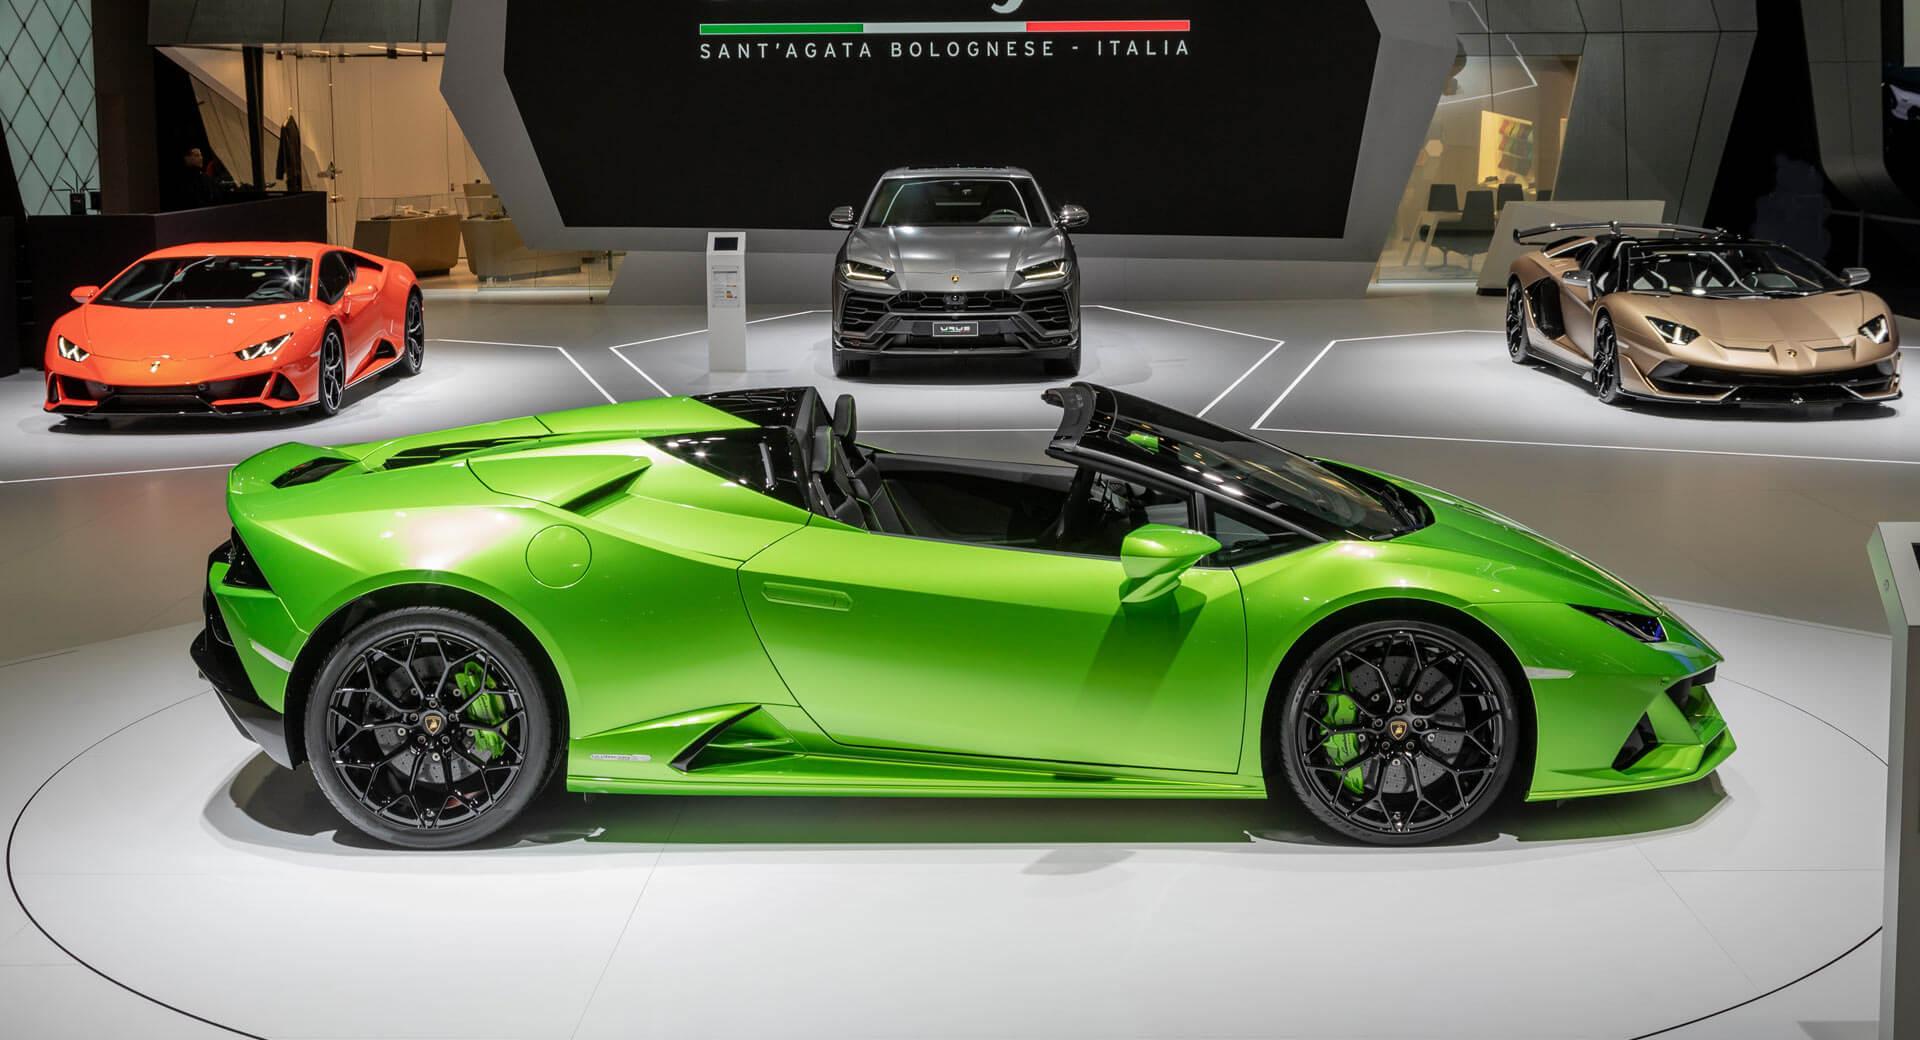 Lamborghini salão automóvel